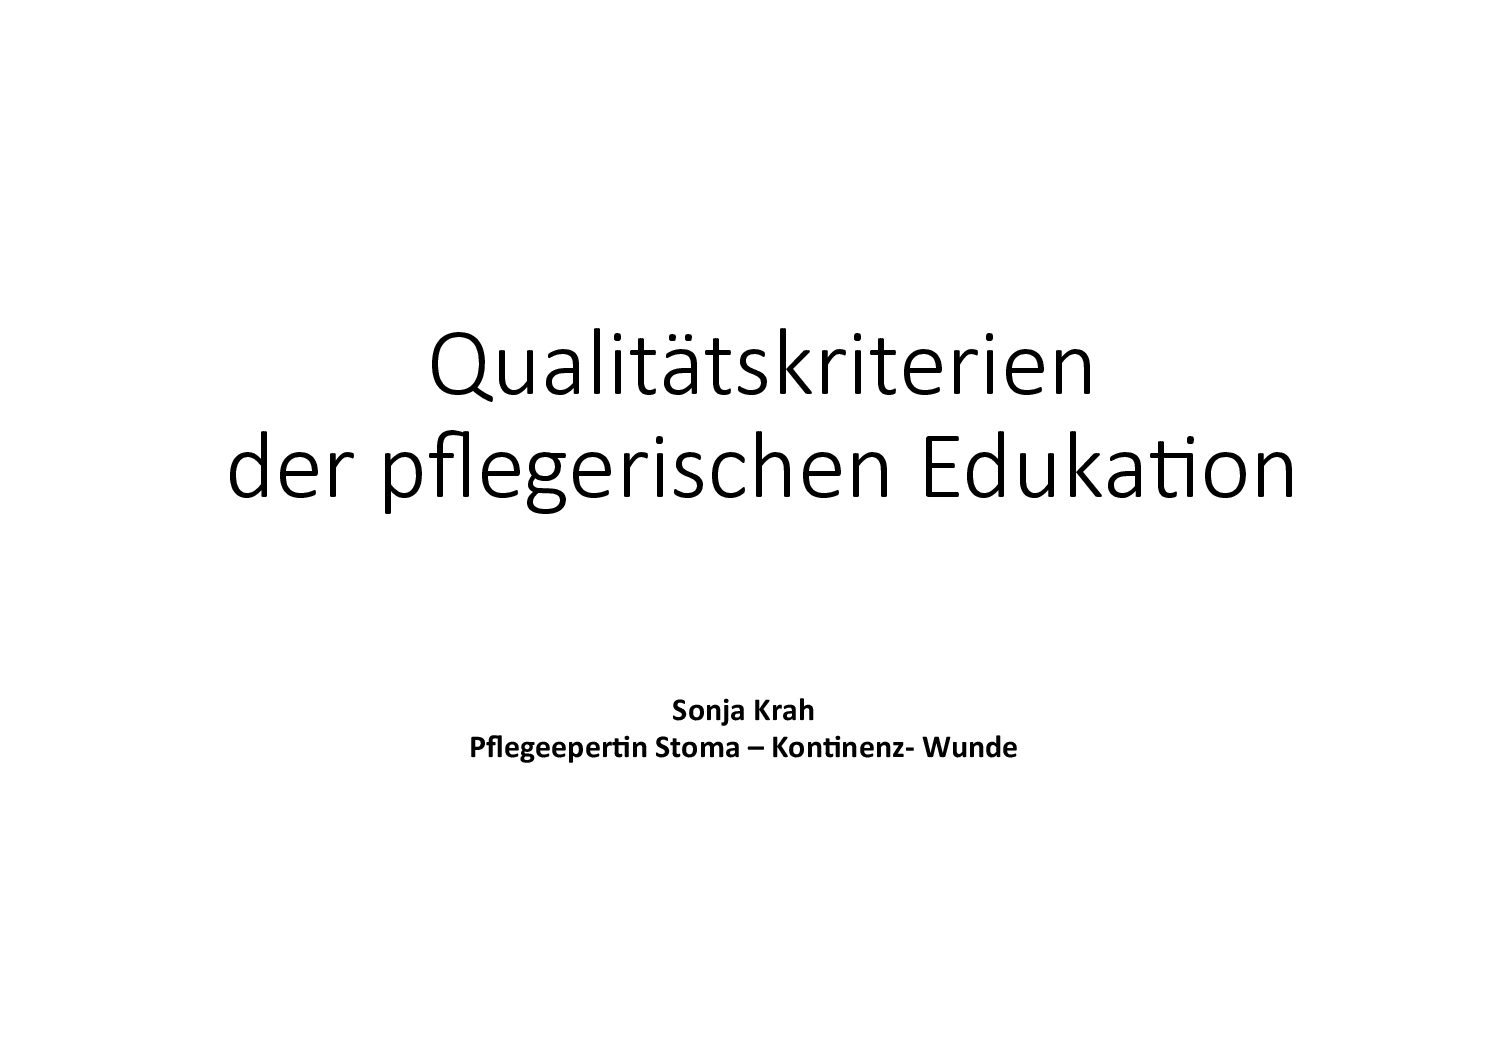 Qualitaetskriterien PDF